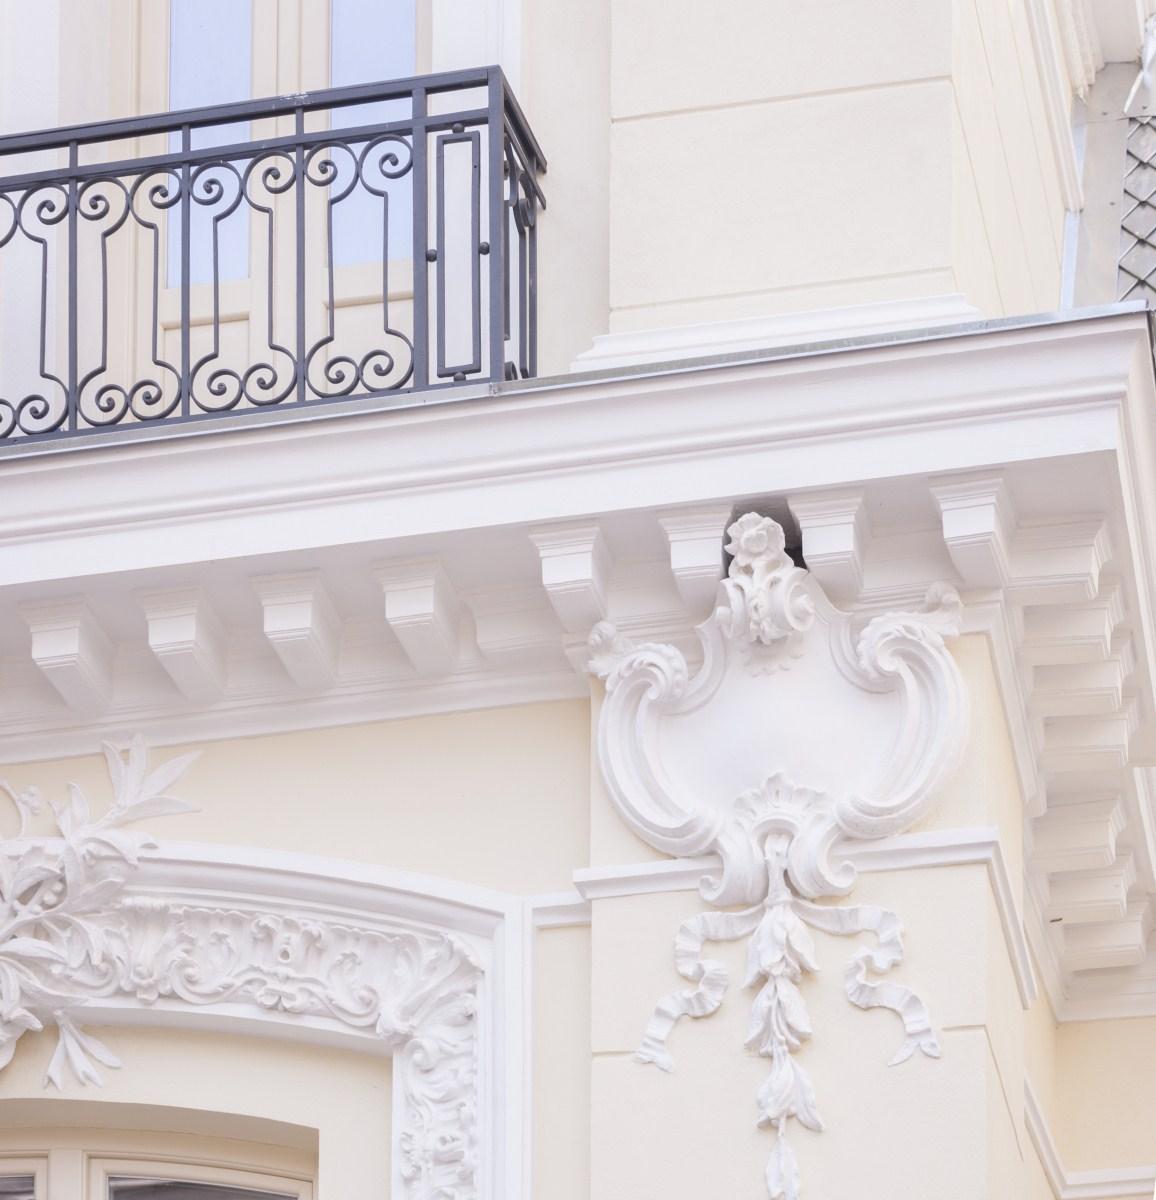 https://nbc-arhitect.ro/wp-content/uploads/2020/10/NBC-Arhitect-_-restorations-_-Sfintilor-House-_-Romania_12.jpg